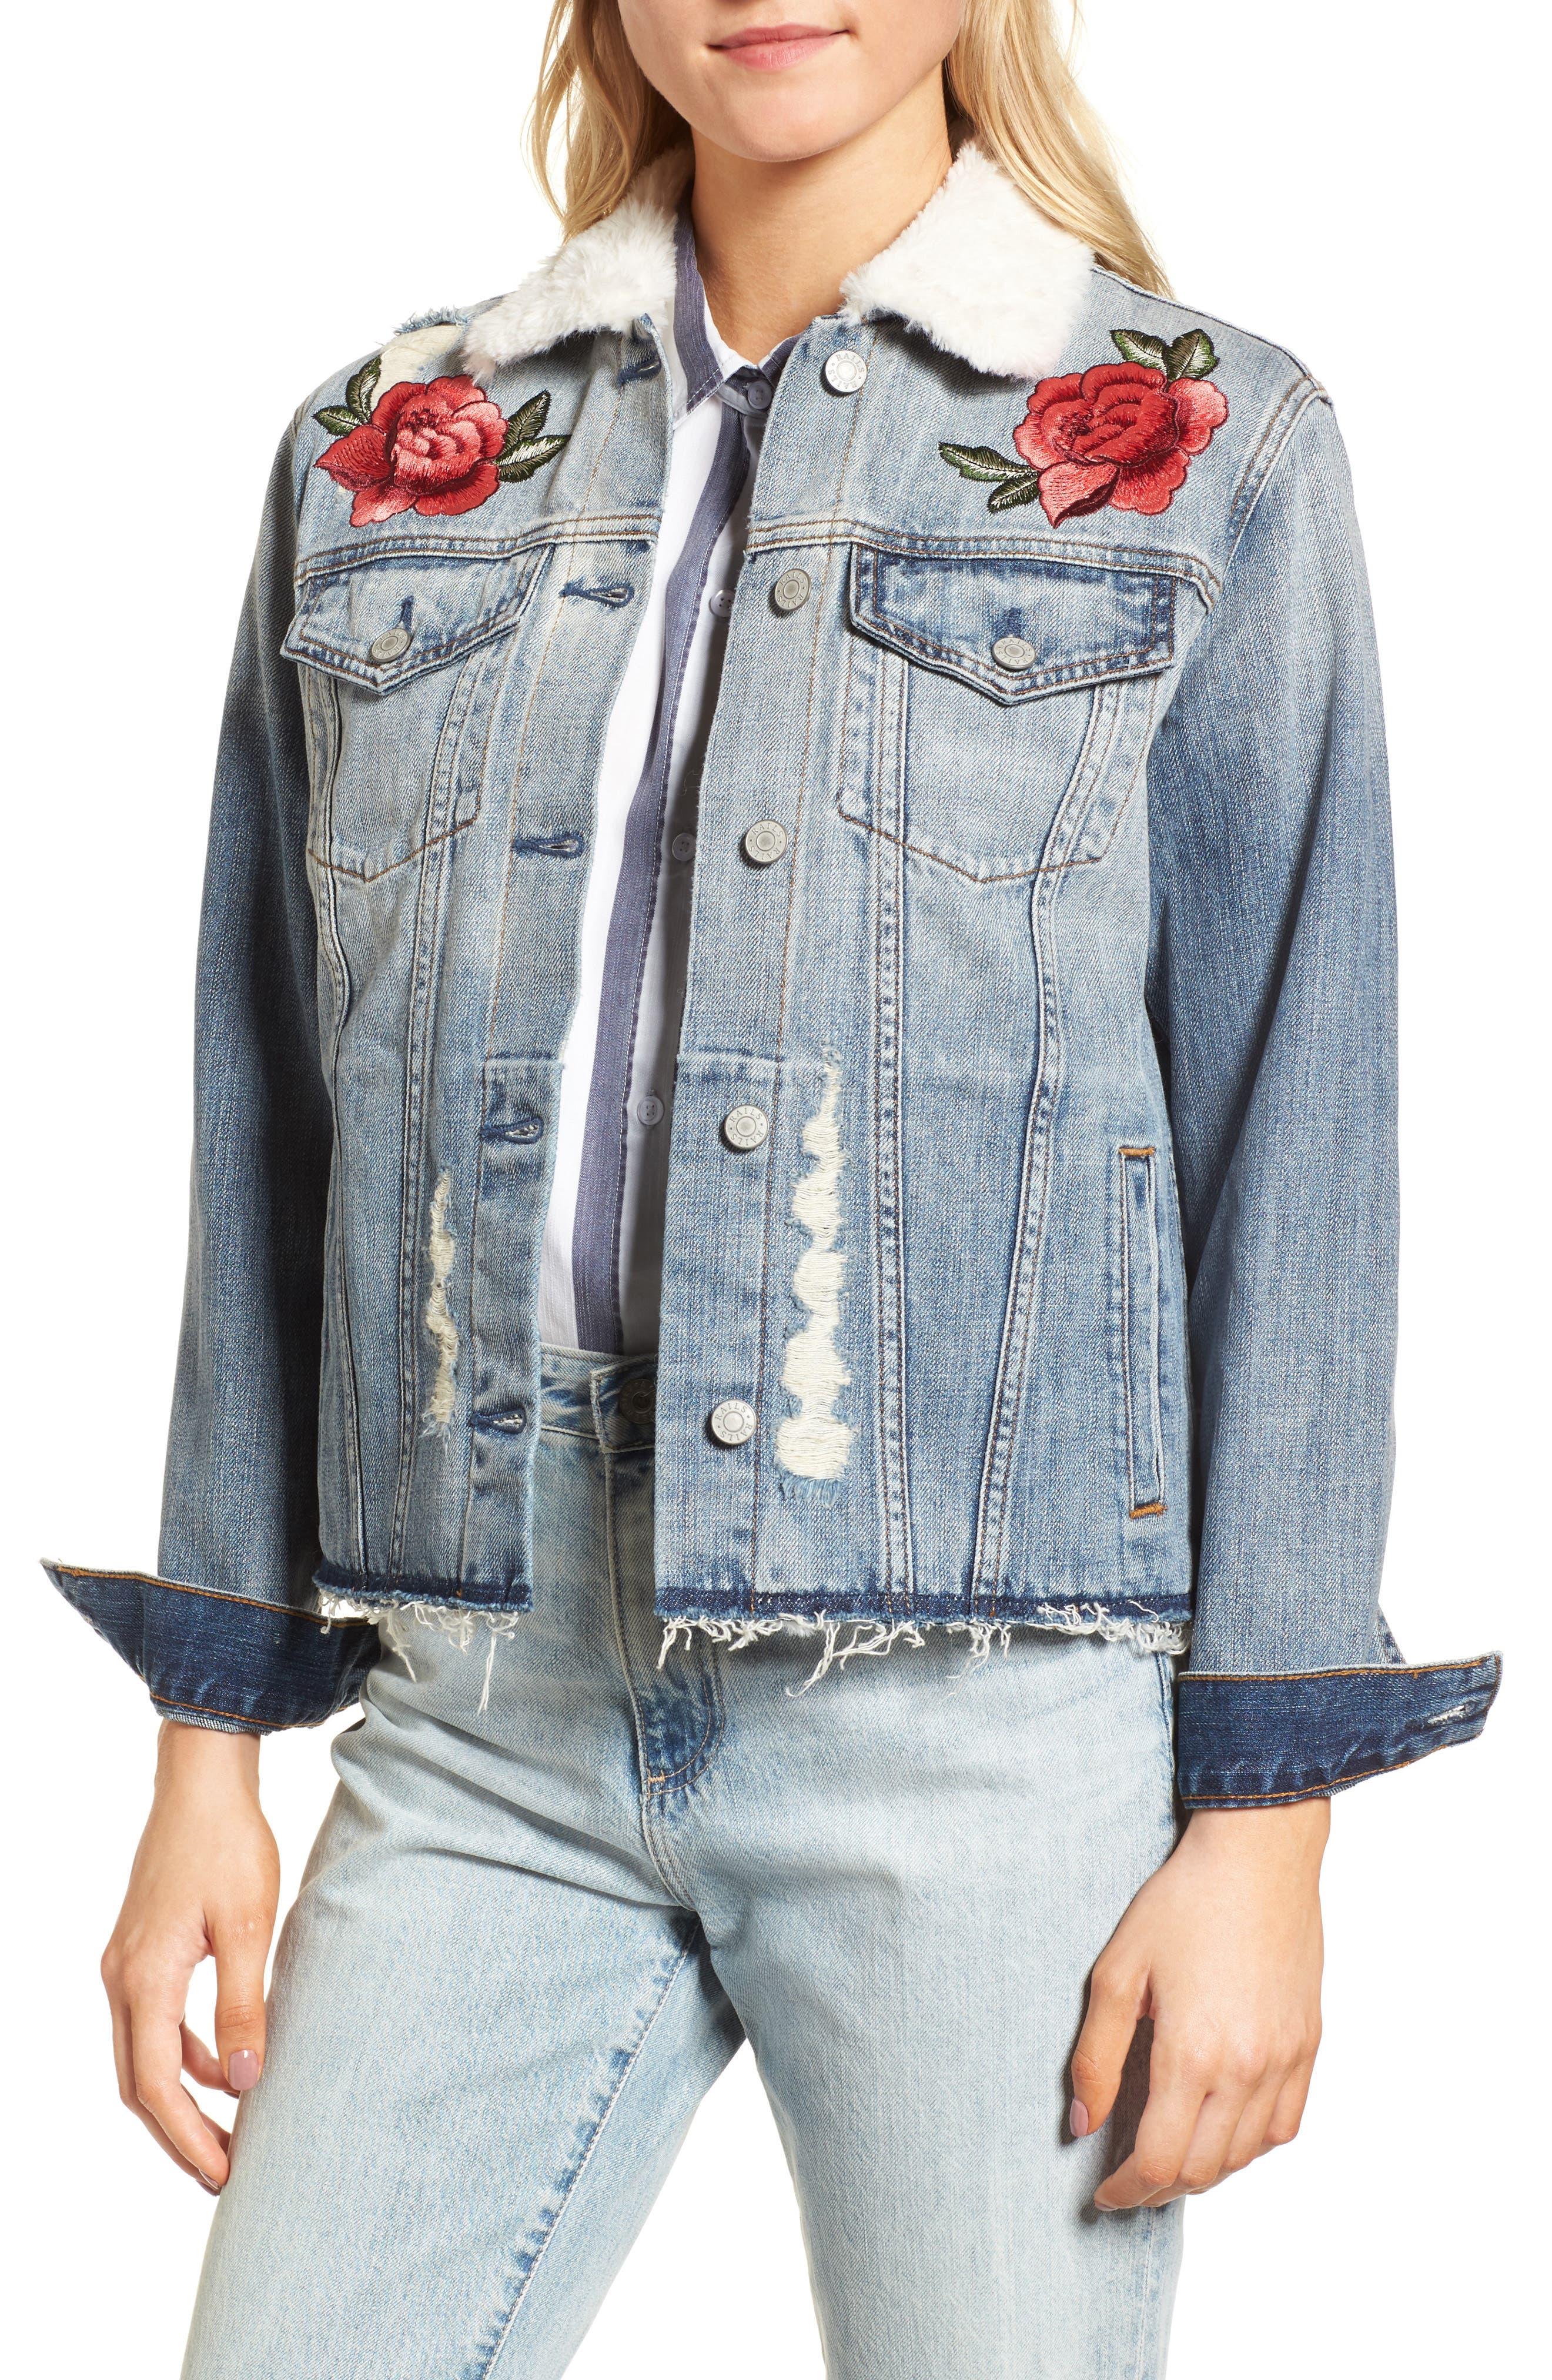 Main Image - Rails Ramsey Embroidered Denim Jacket